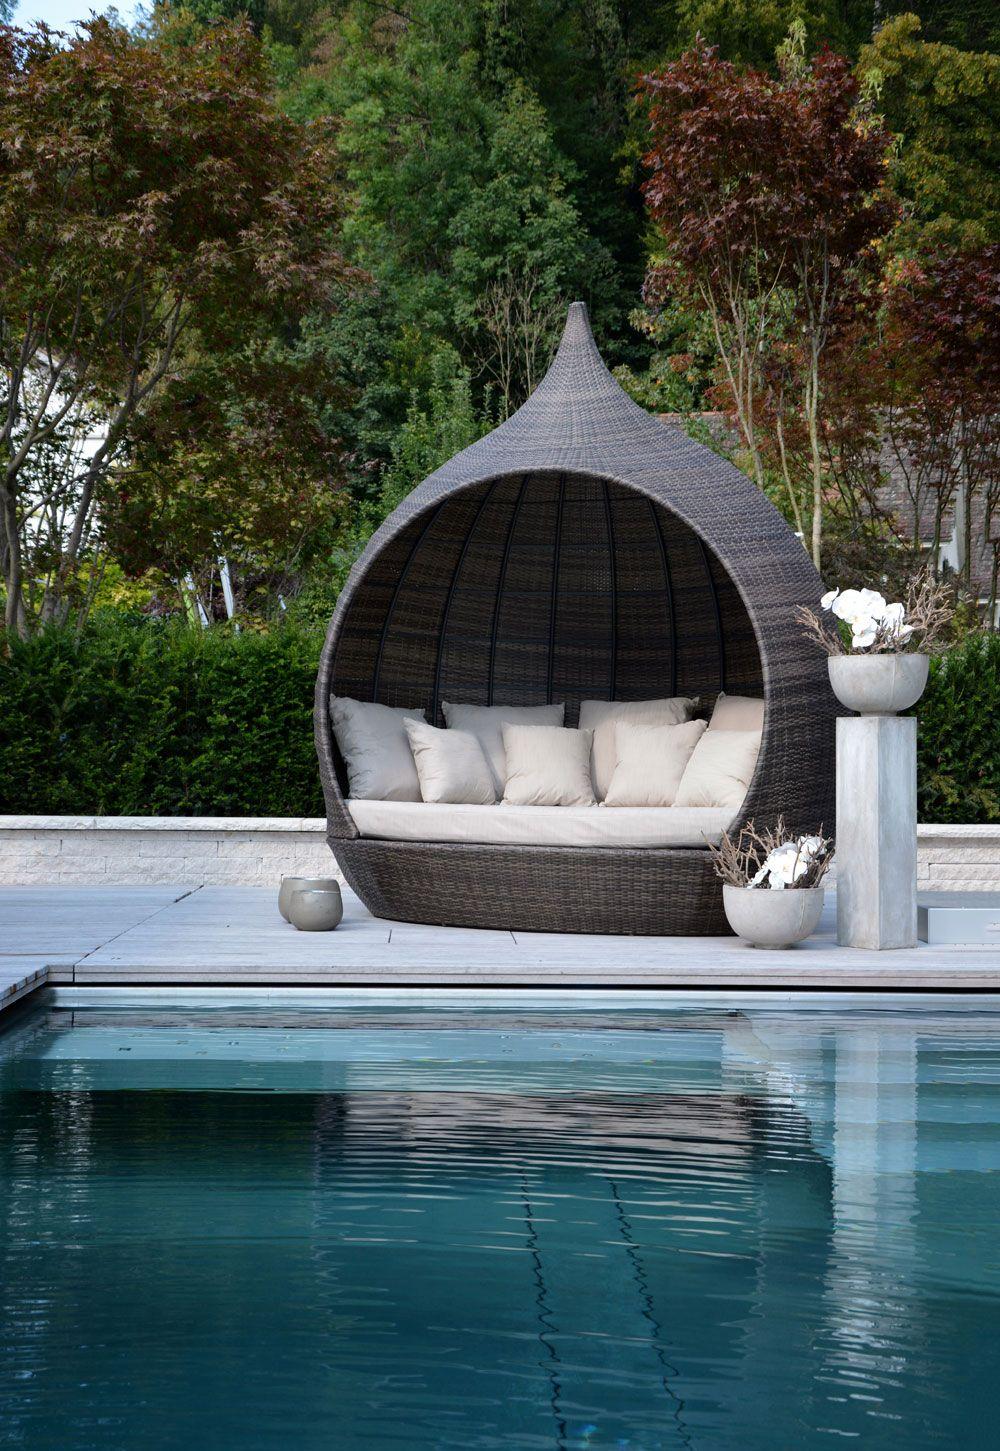 Outdoor Furniture Safari Liegeinsel Liegeinsel Garten Hinterhof Terrassen Designs Gartenmobel